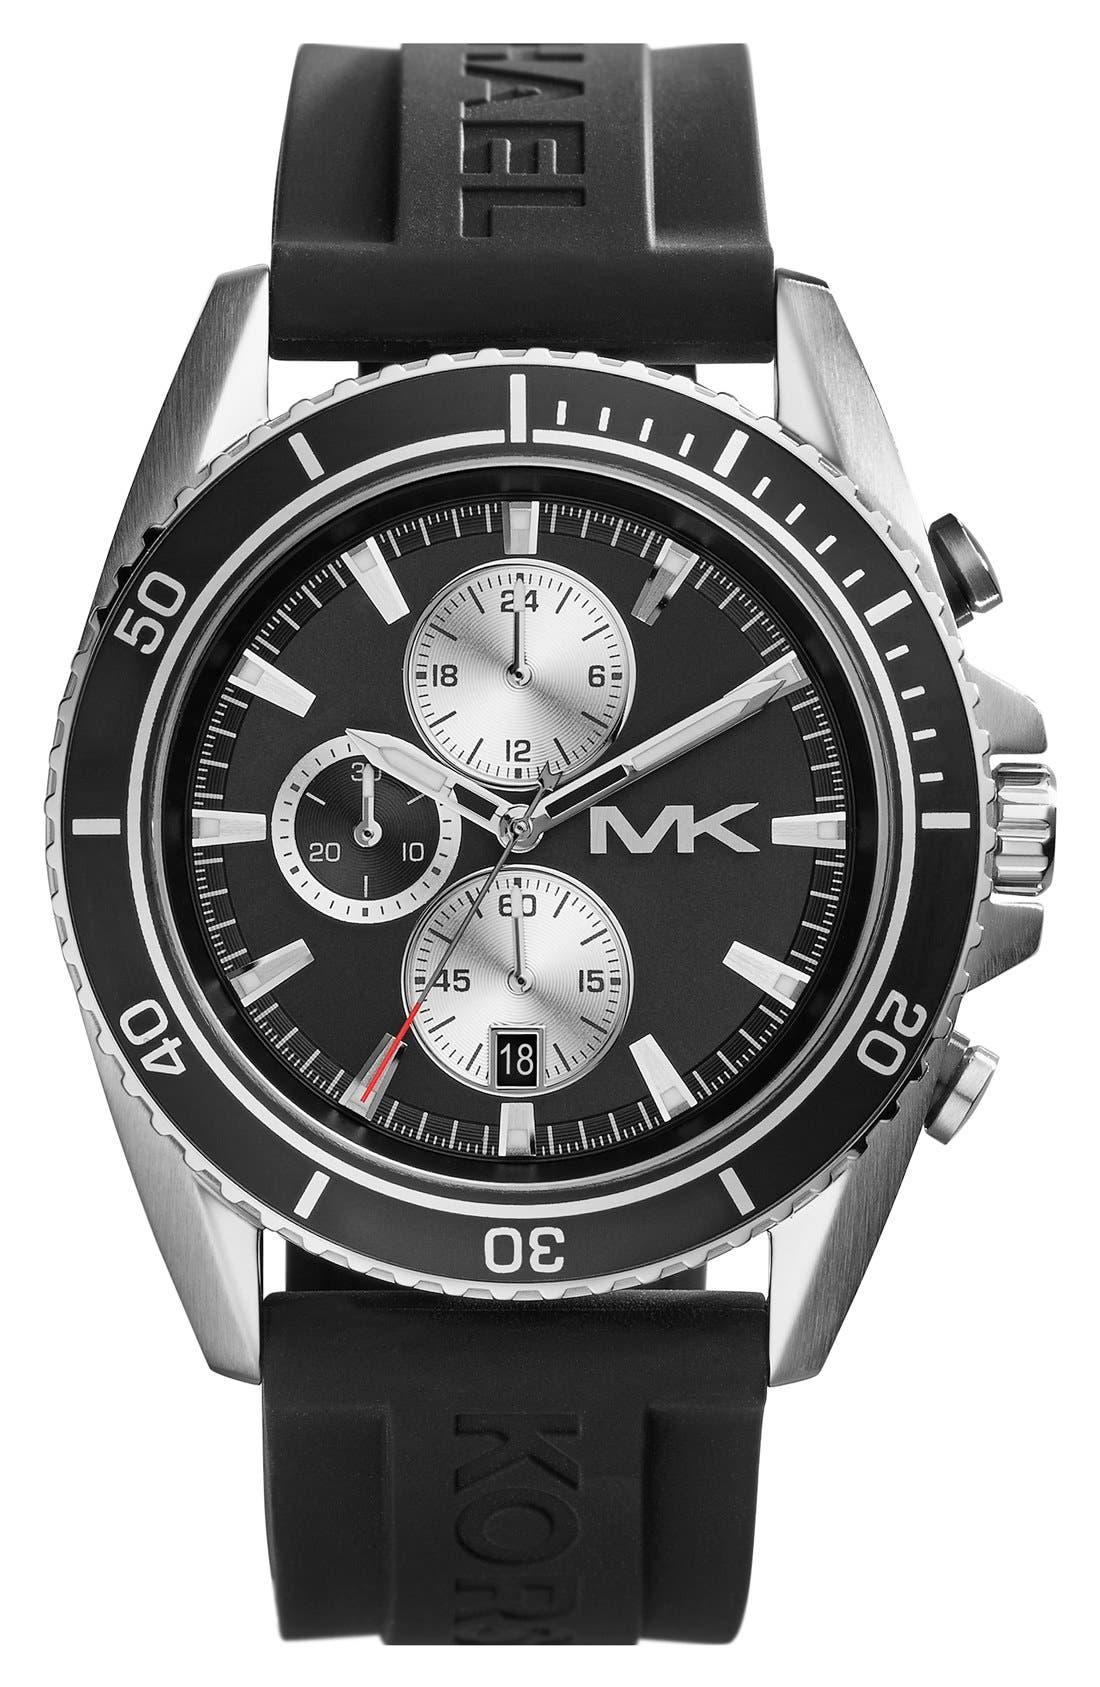 Main Image - Michael Kors 'Lansing' Chronograph Silicone Strap Watch, 45mm